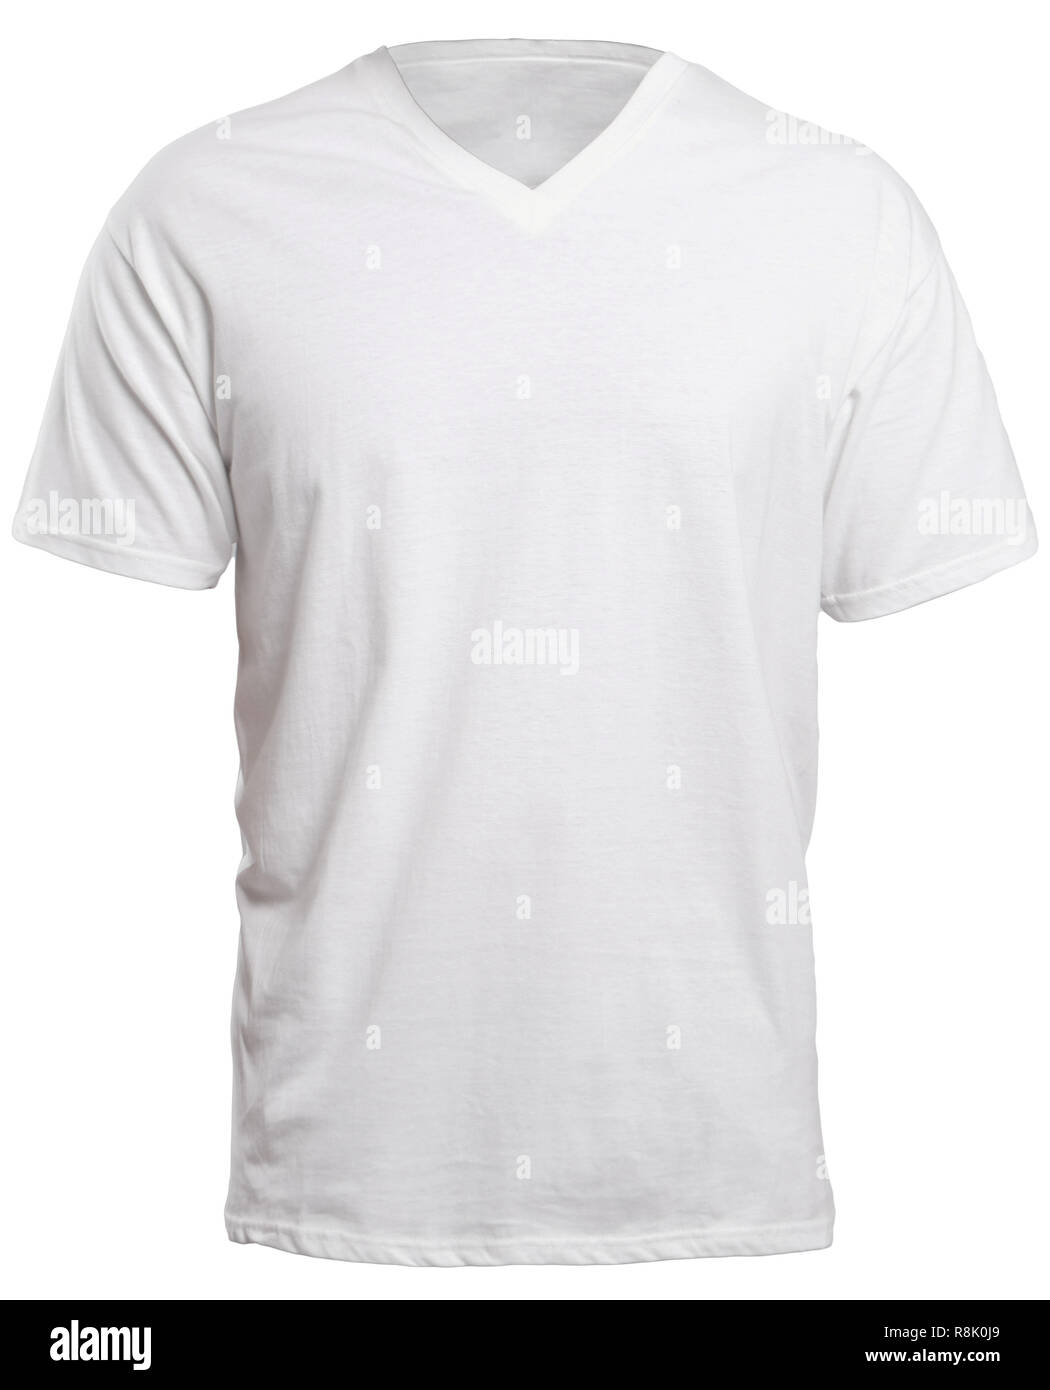 523606c34c9c59 Blank v-neck shirt mock up template, front view, isolated on white, plain t- shirt mockup. V Neck tee design presentation for print.